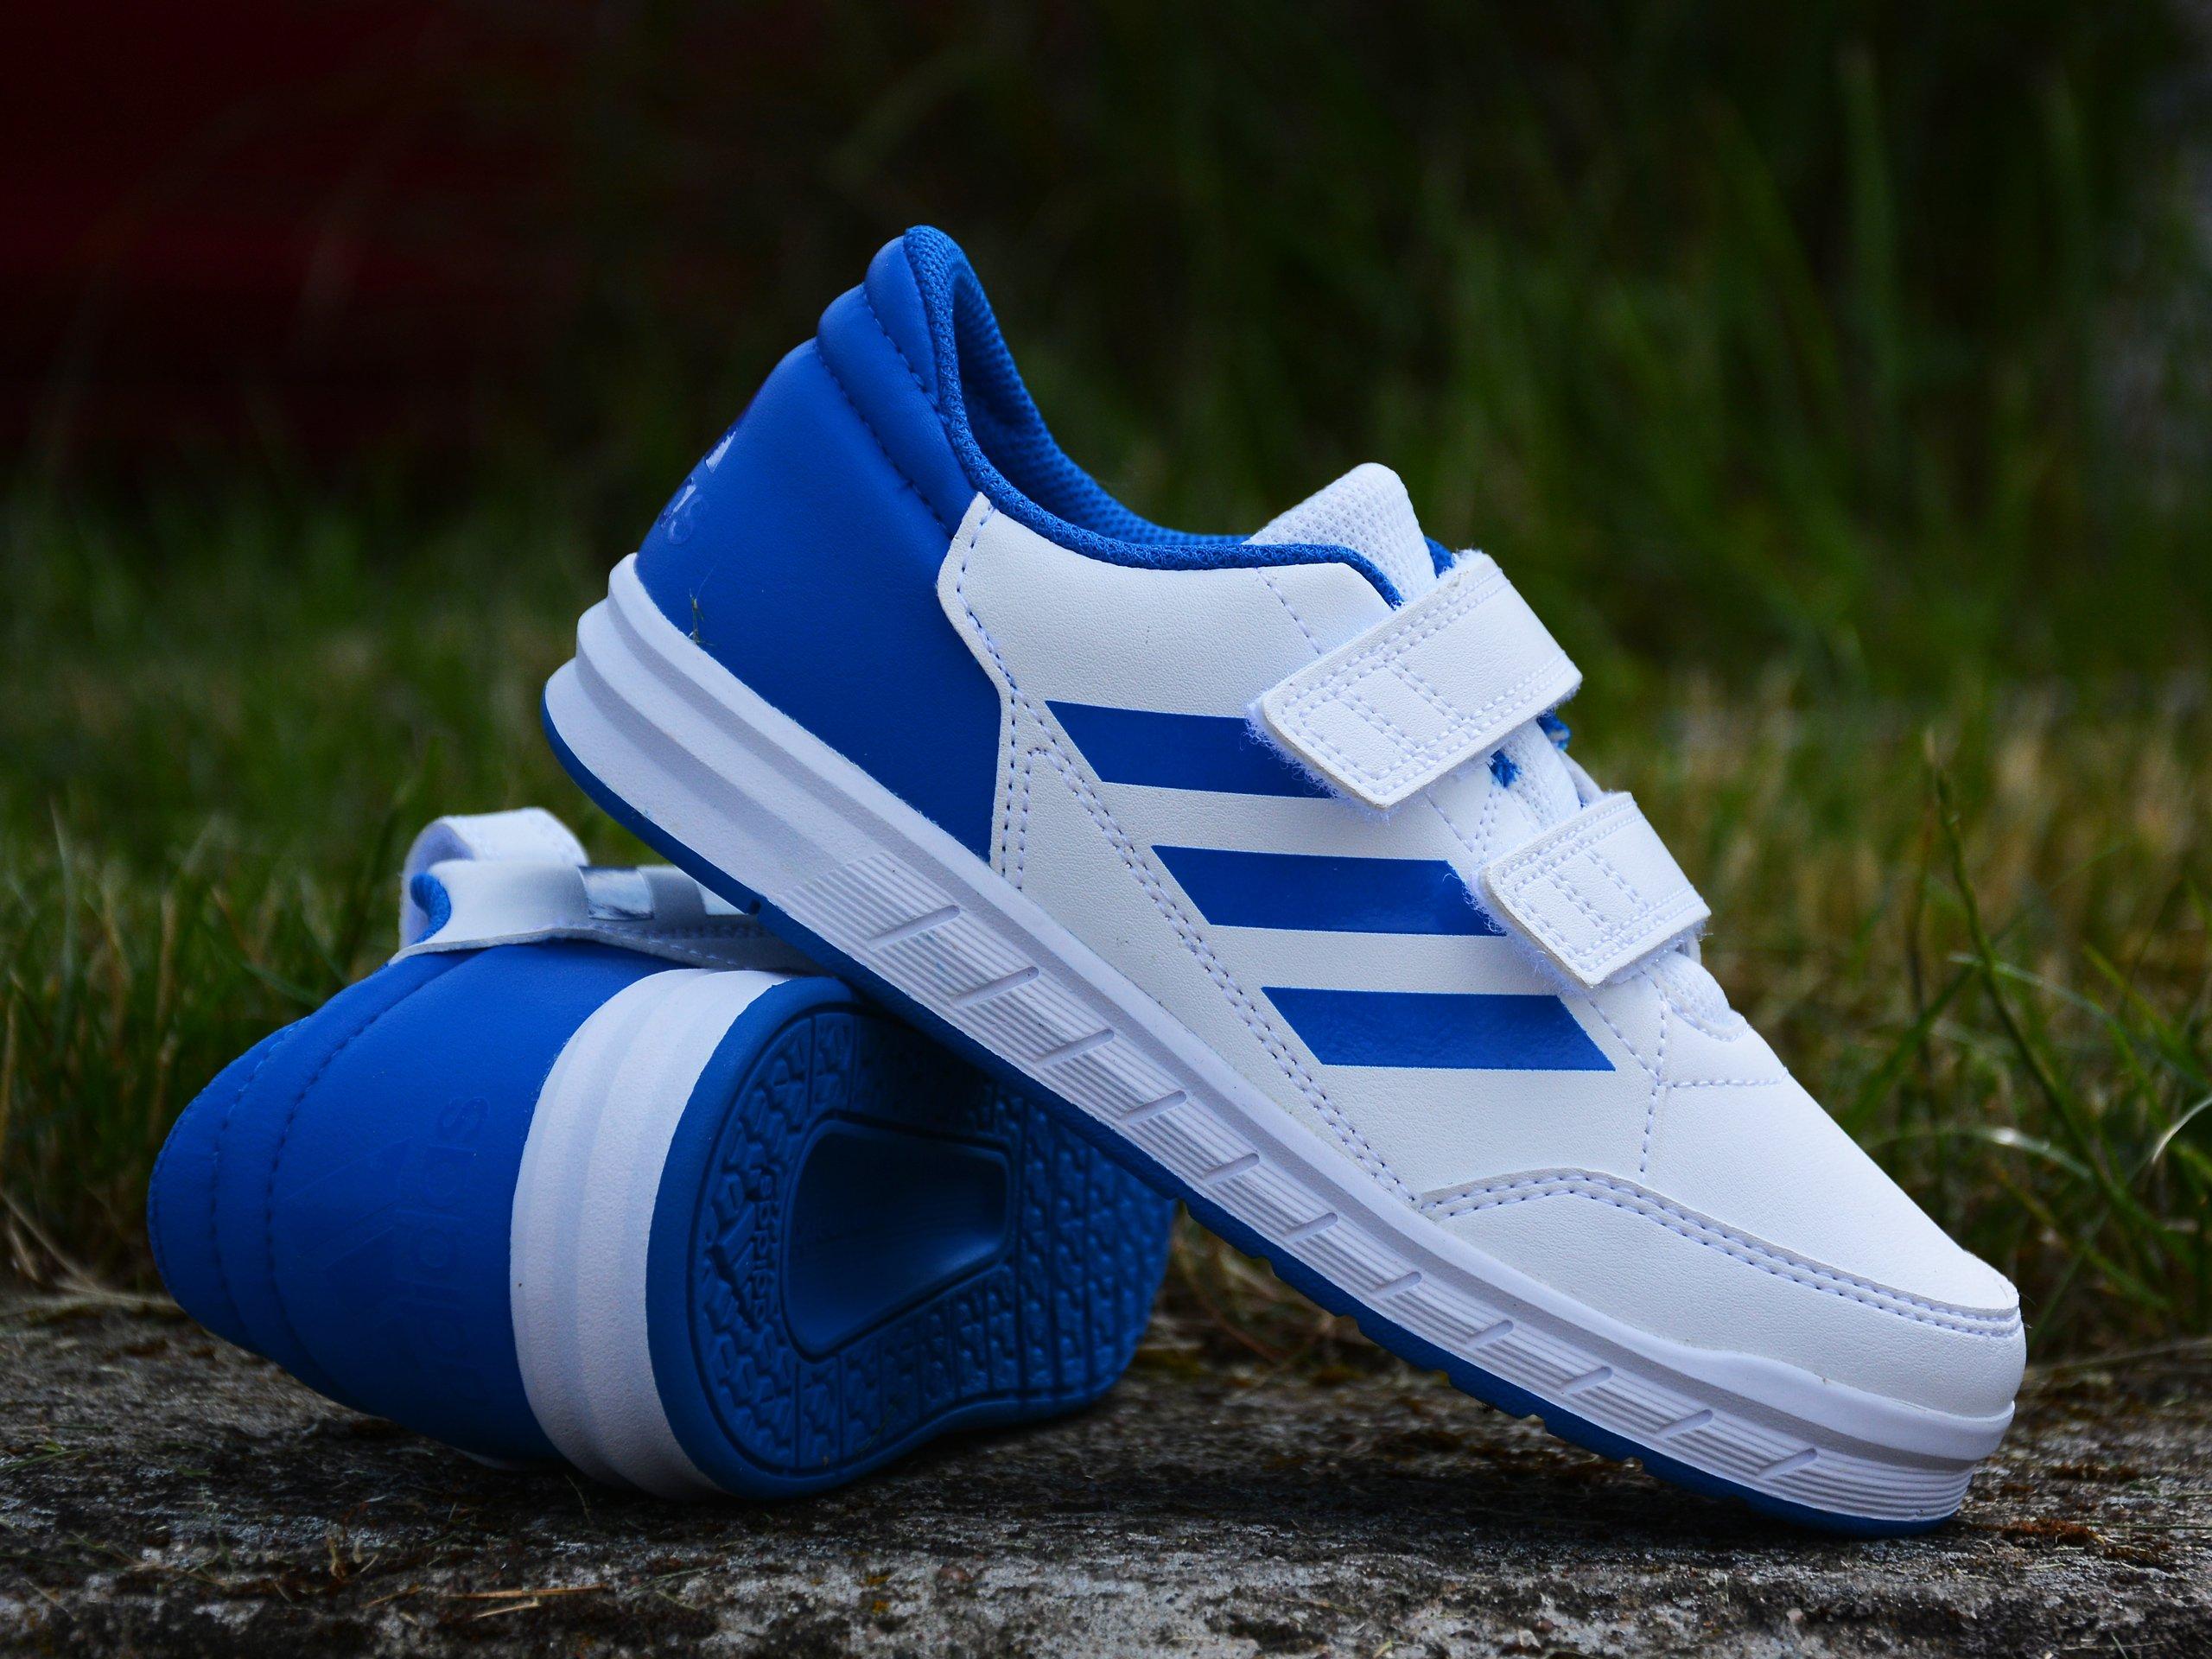 Adidas - Altasport D96827 - Sneakers - White / Blue